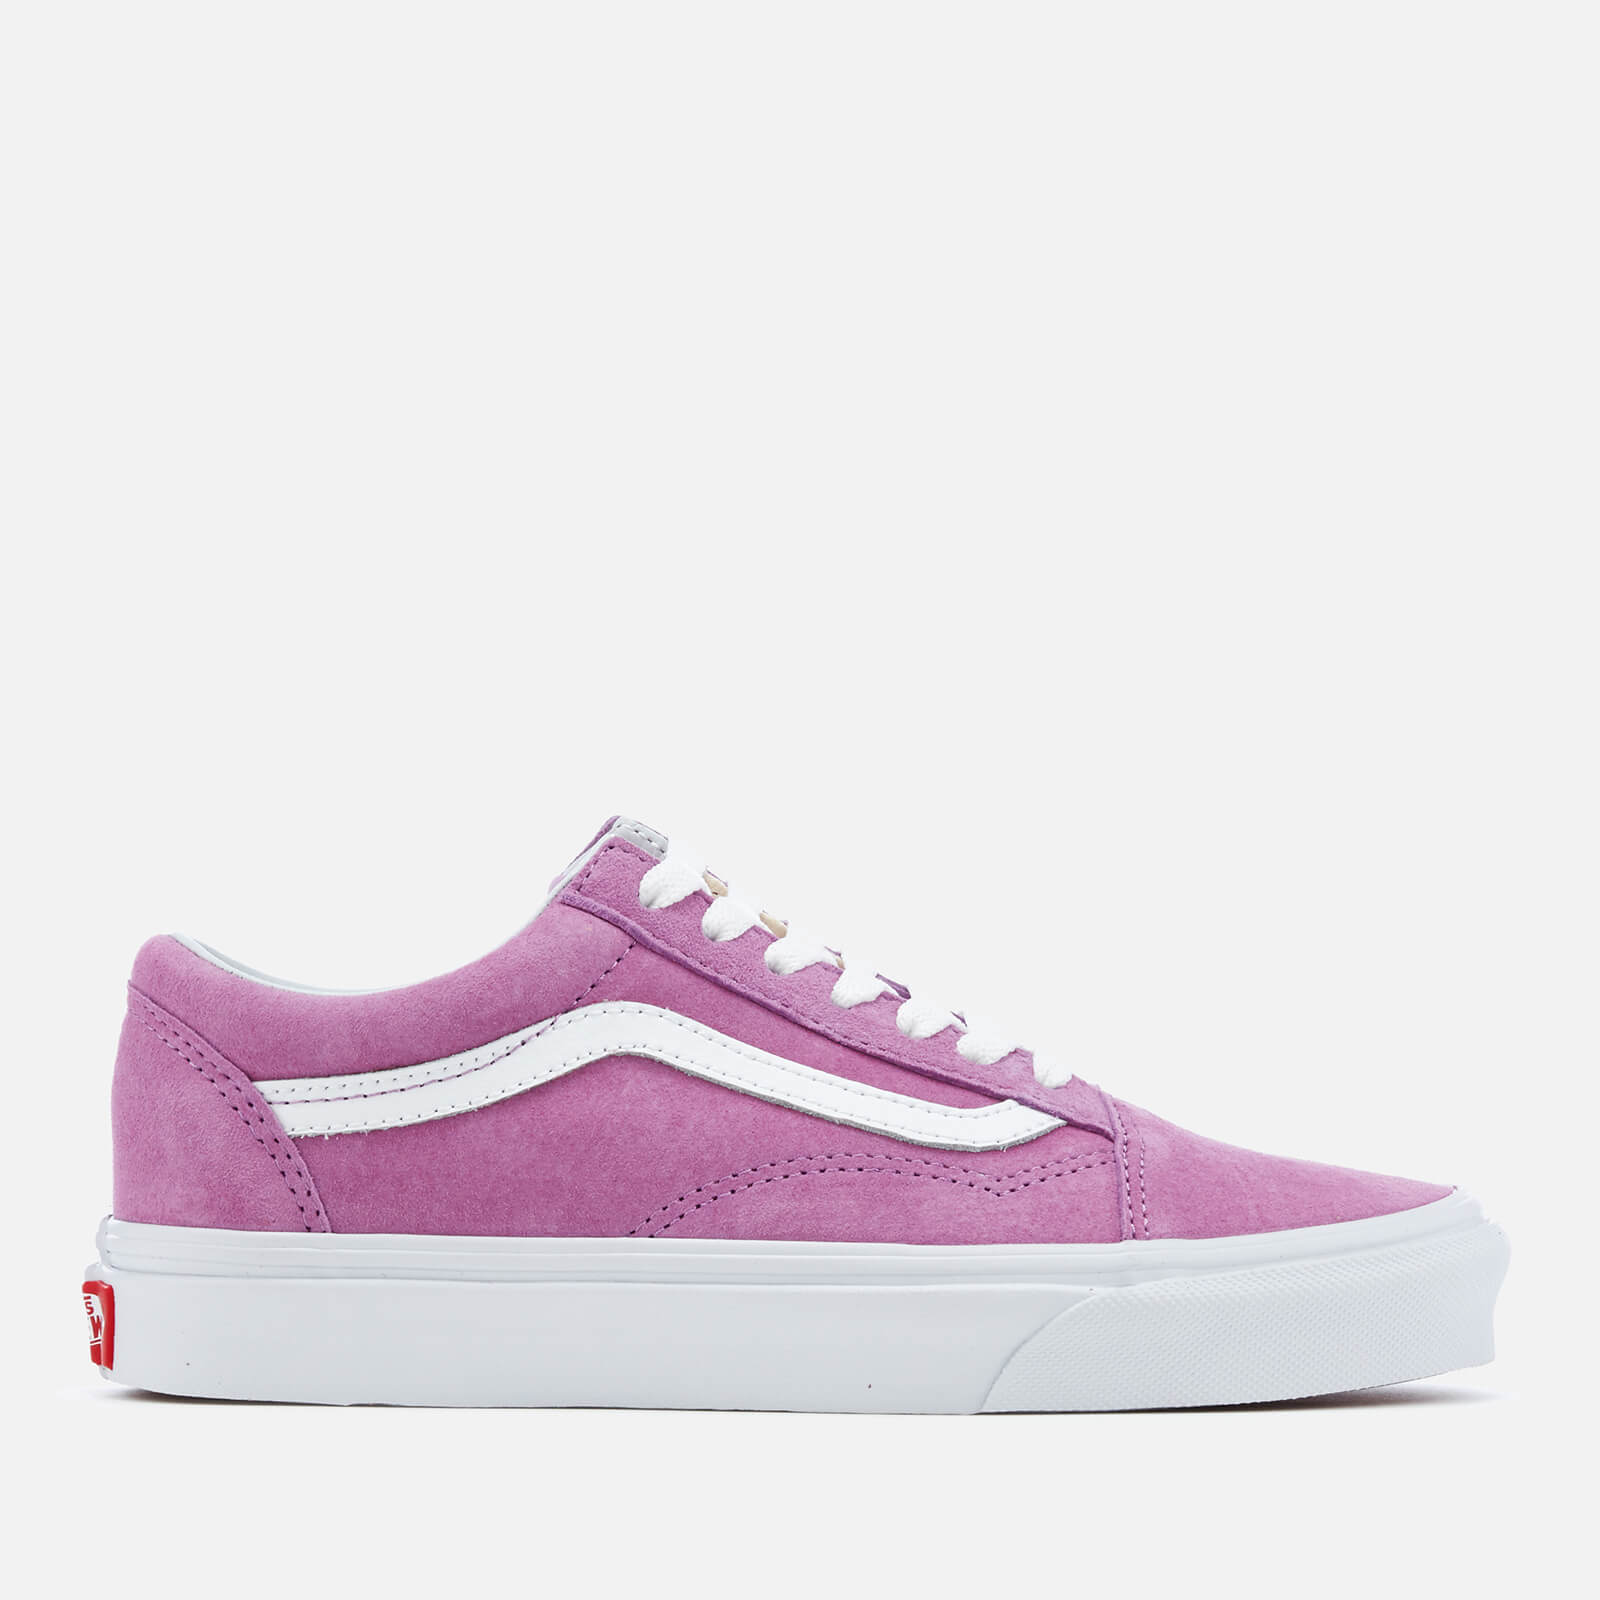 5a538ca98f Vans Women s Old Skool Suede Trainers - Purple True White - Free UK ...